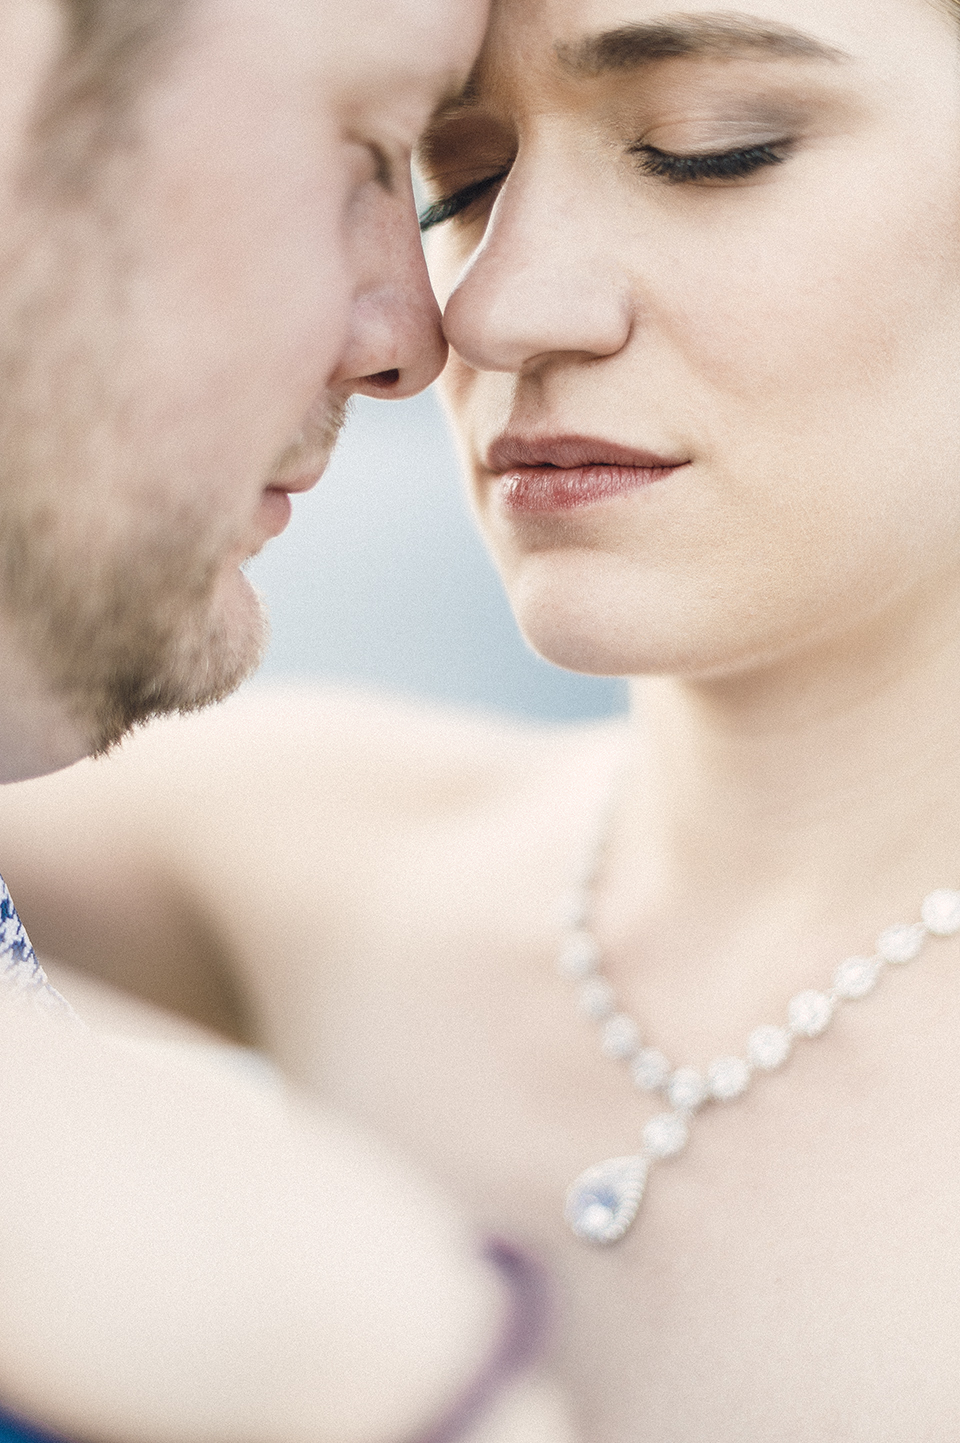 RyanParker_WeddingPhotographer_CapeTown_Hermanus_Stanford_Mosaic_Overberg_DSC_1104 copy.jpg